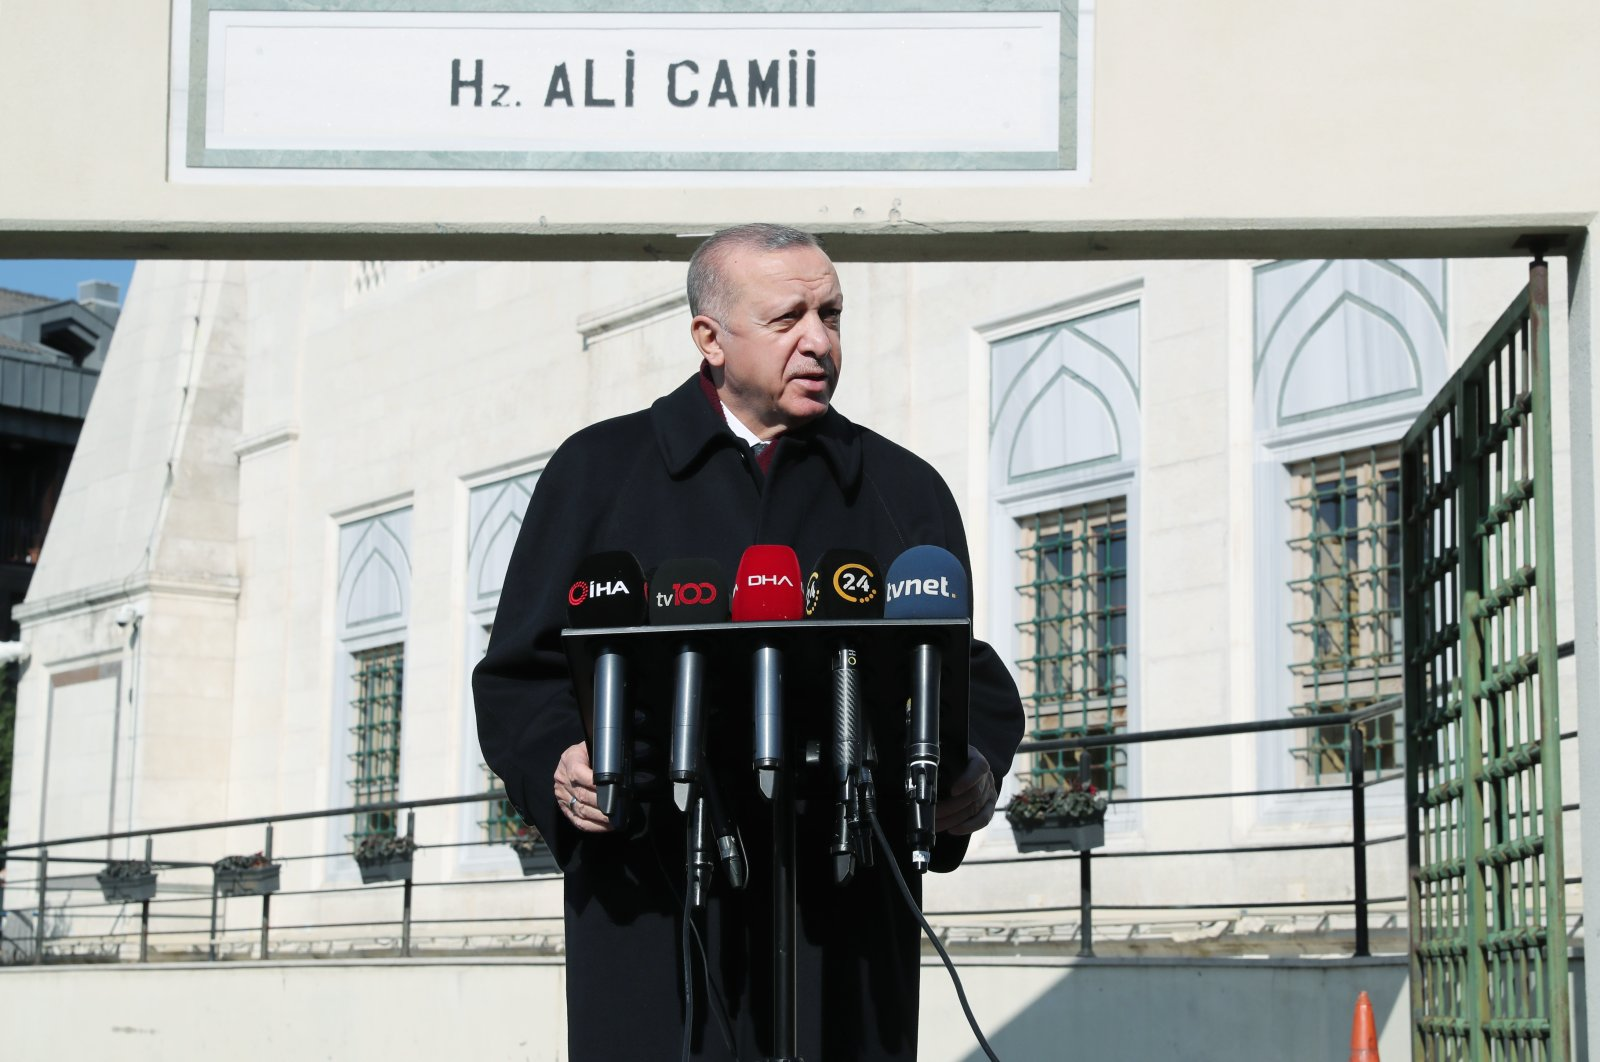 President Recep Tayyip Erdoğan speaks to reporters after Friday prayers in Istanbul, Turkey, Feb. 5, 2021. (AA Photo)